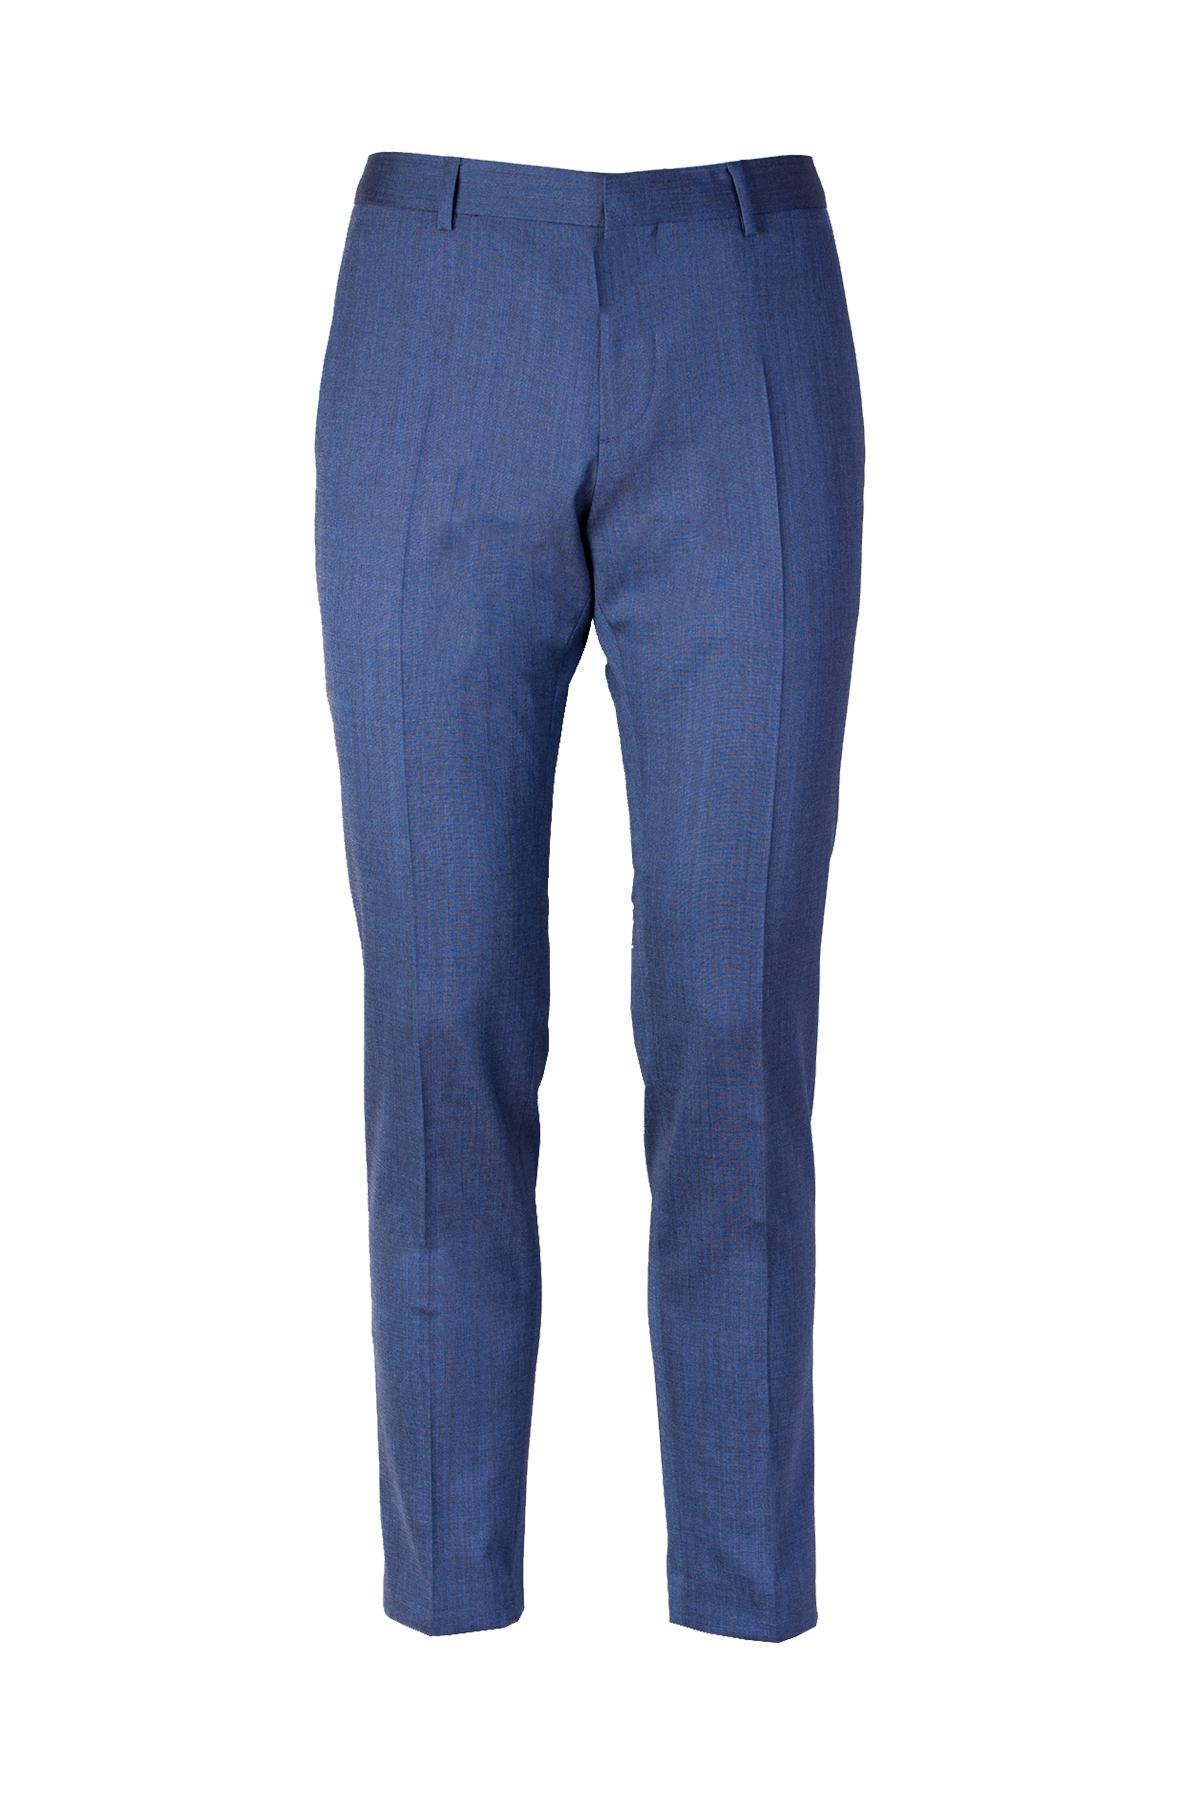 PANTALONE BLUE NIGHTS CALVIN KLEIN   Pantalone   K10K100269-PITTSBURGH-BM477DEEPINK